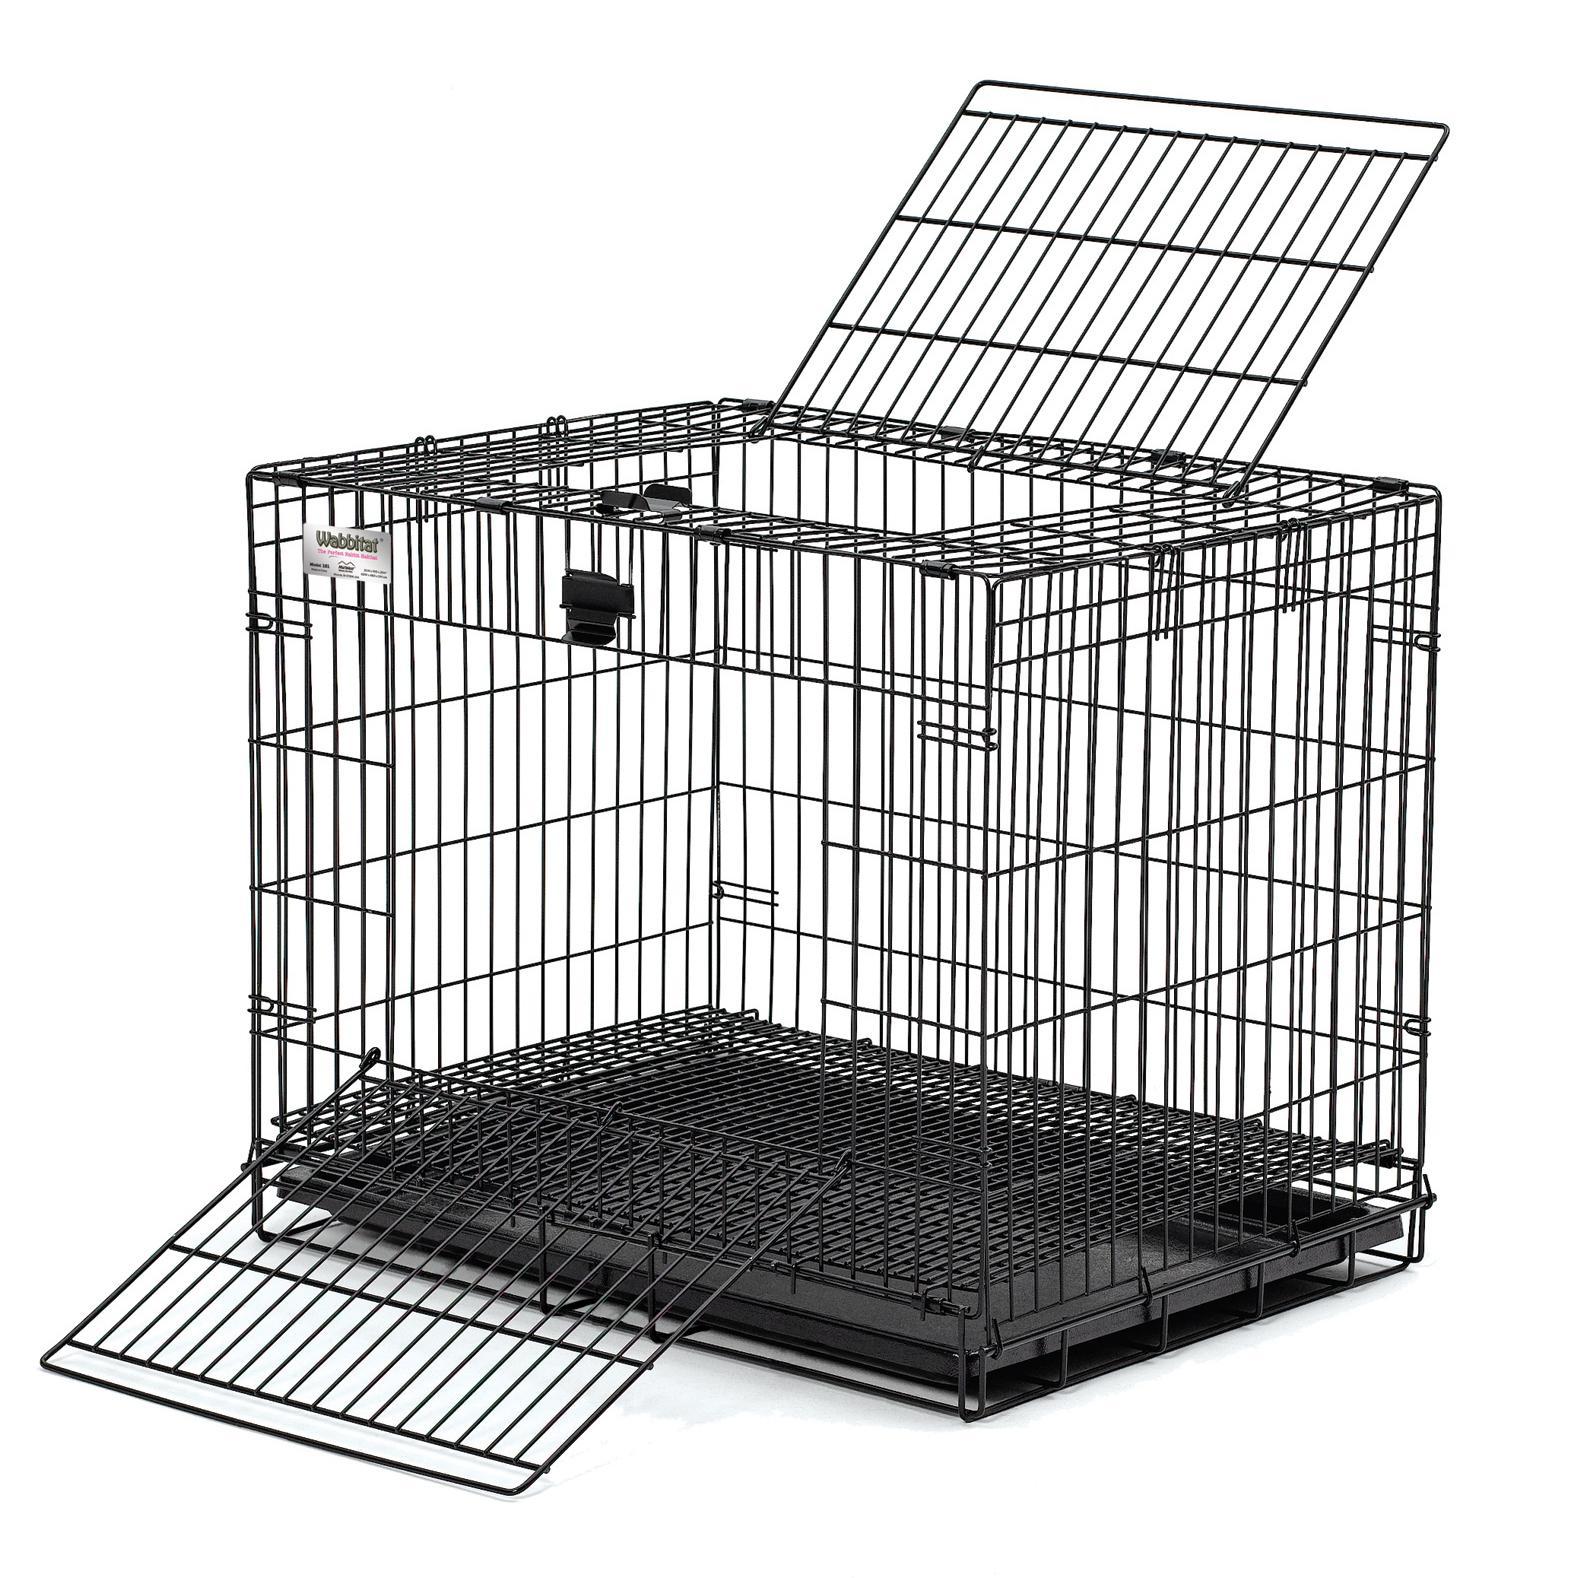 Cage clipart bunny. Midwest wabbitat folding rabbit